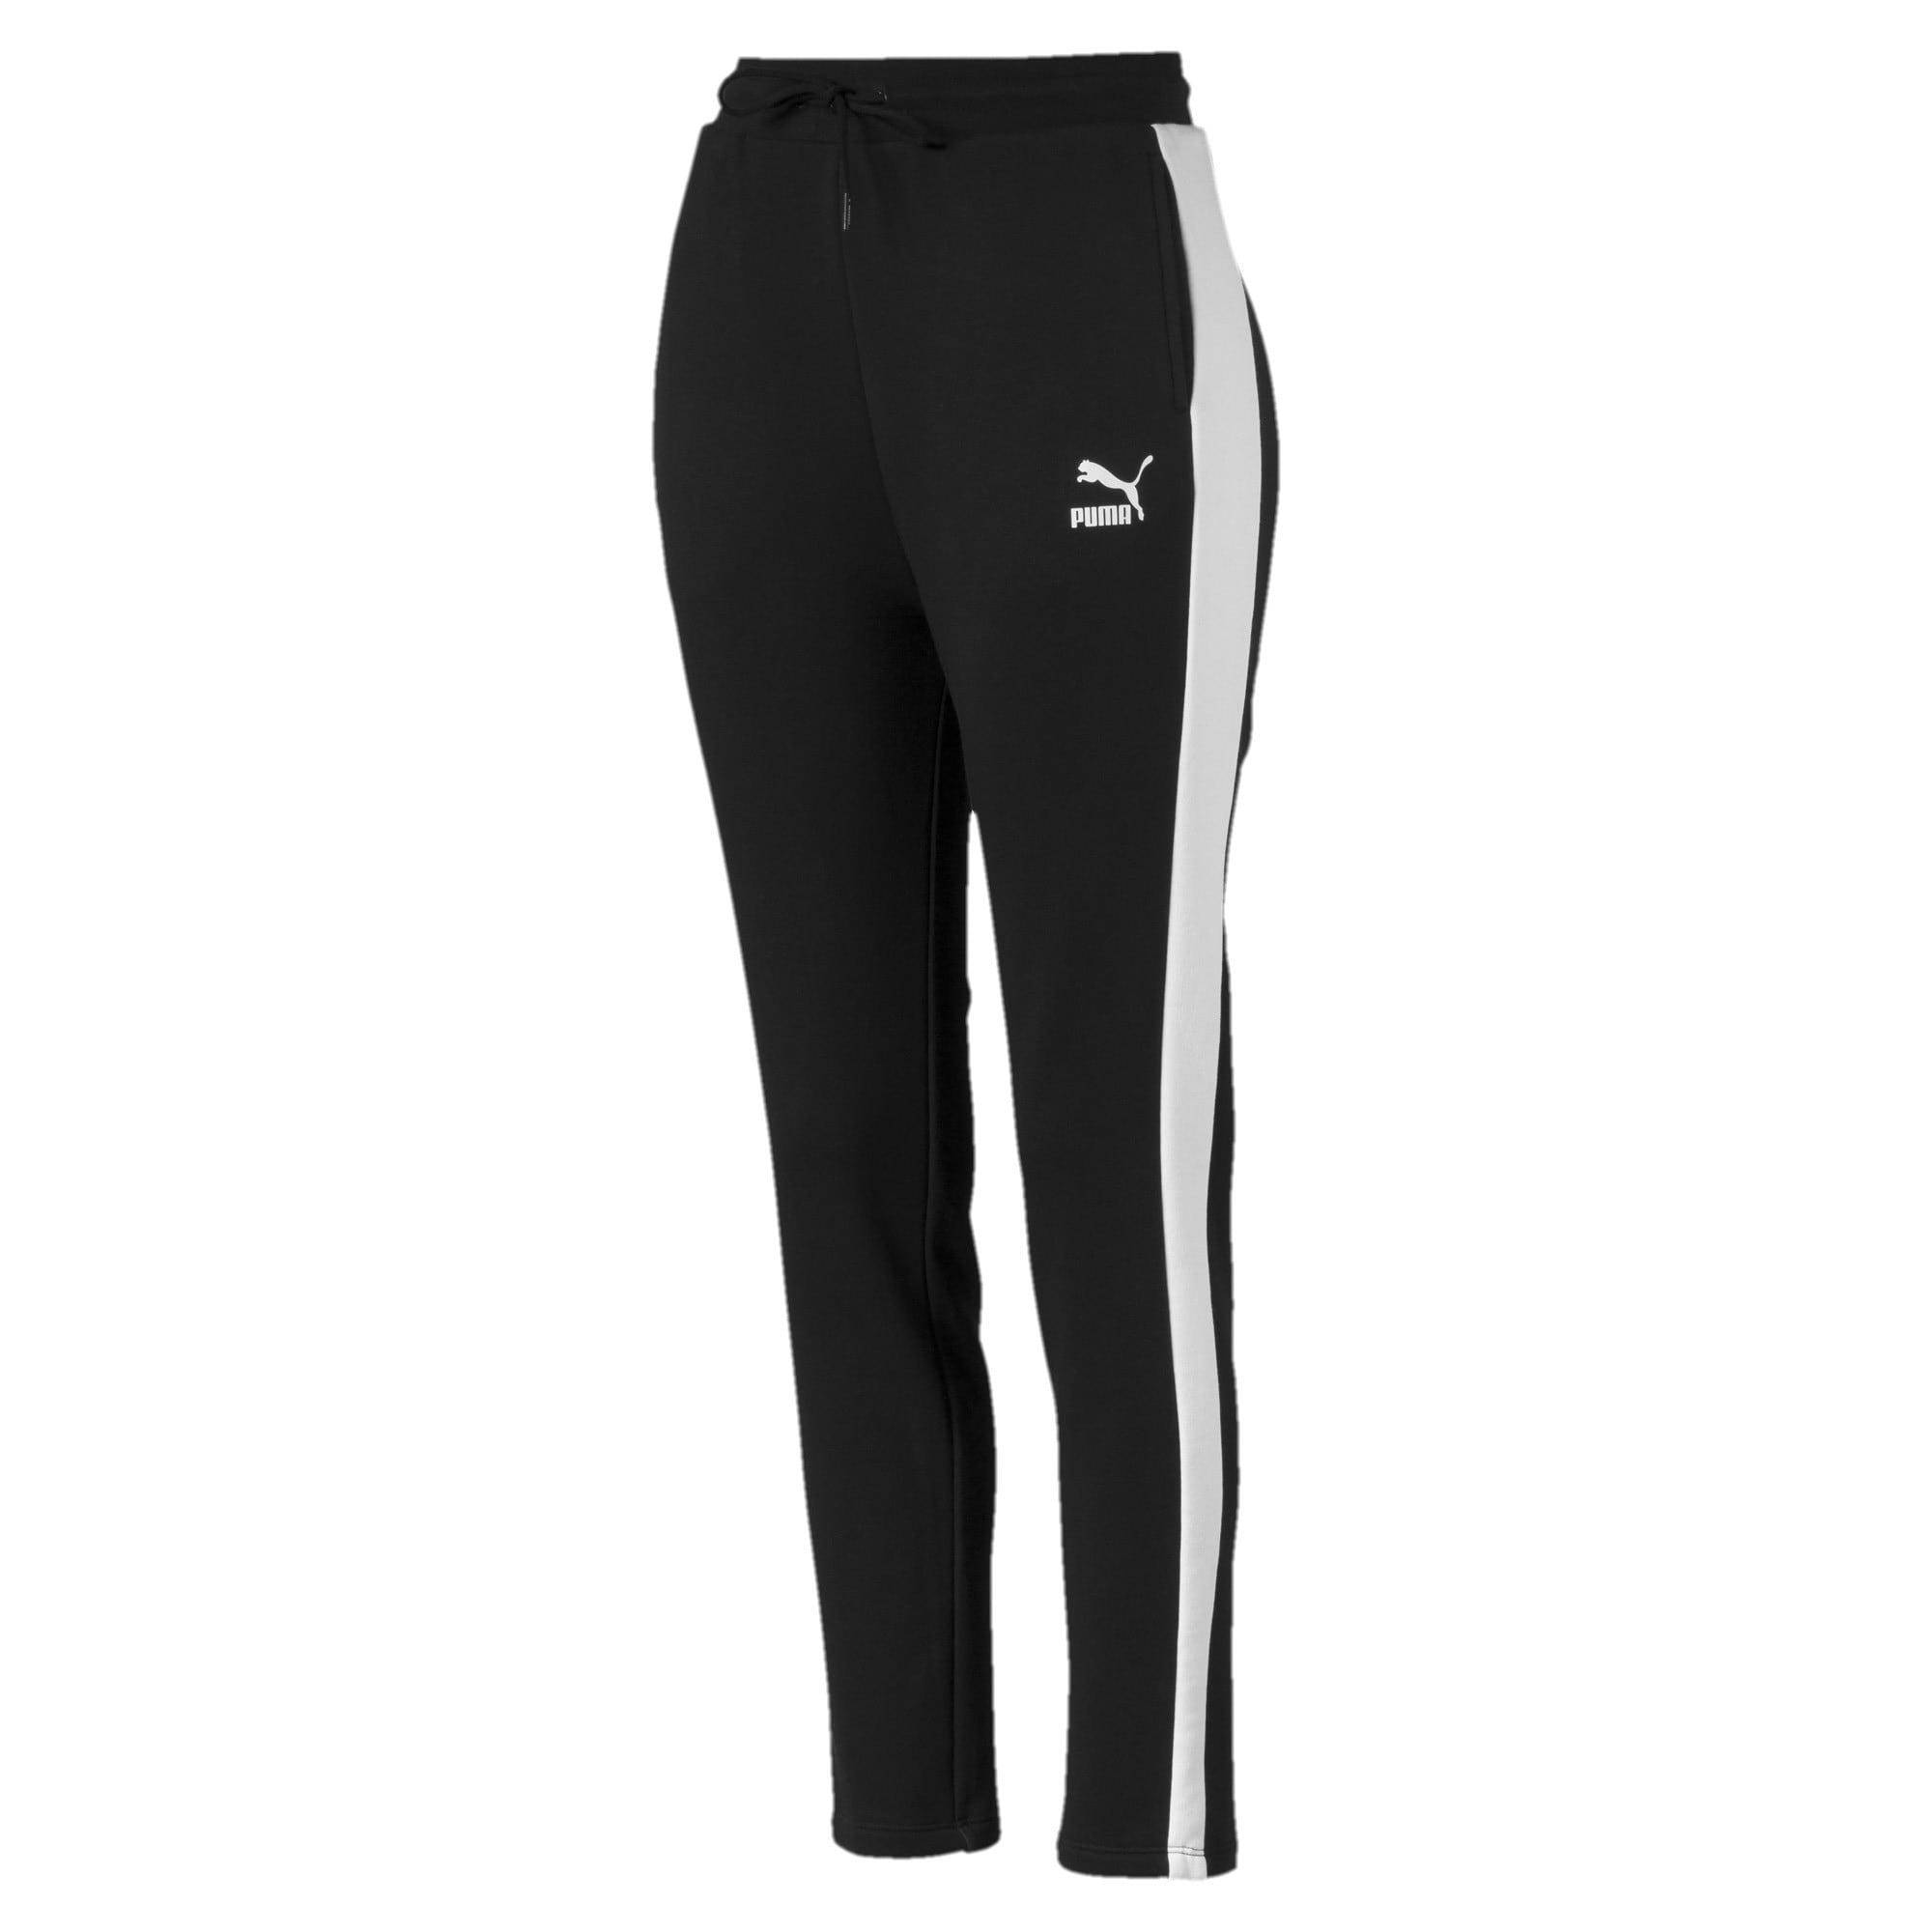 Miniatura 1 de Pantalones deportivos Classics T7 de felpa francesa para mujer, Cotton Black, mediano